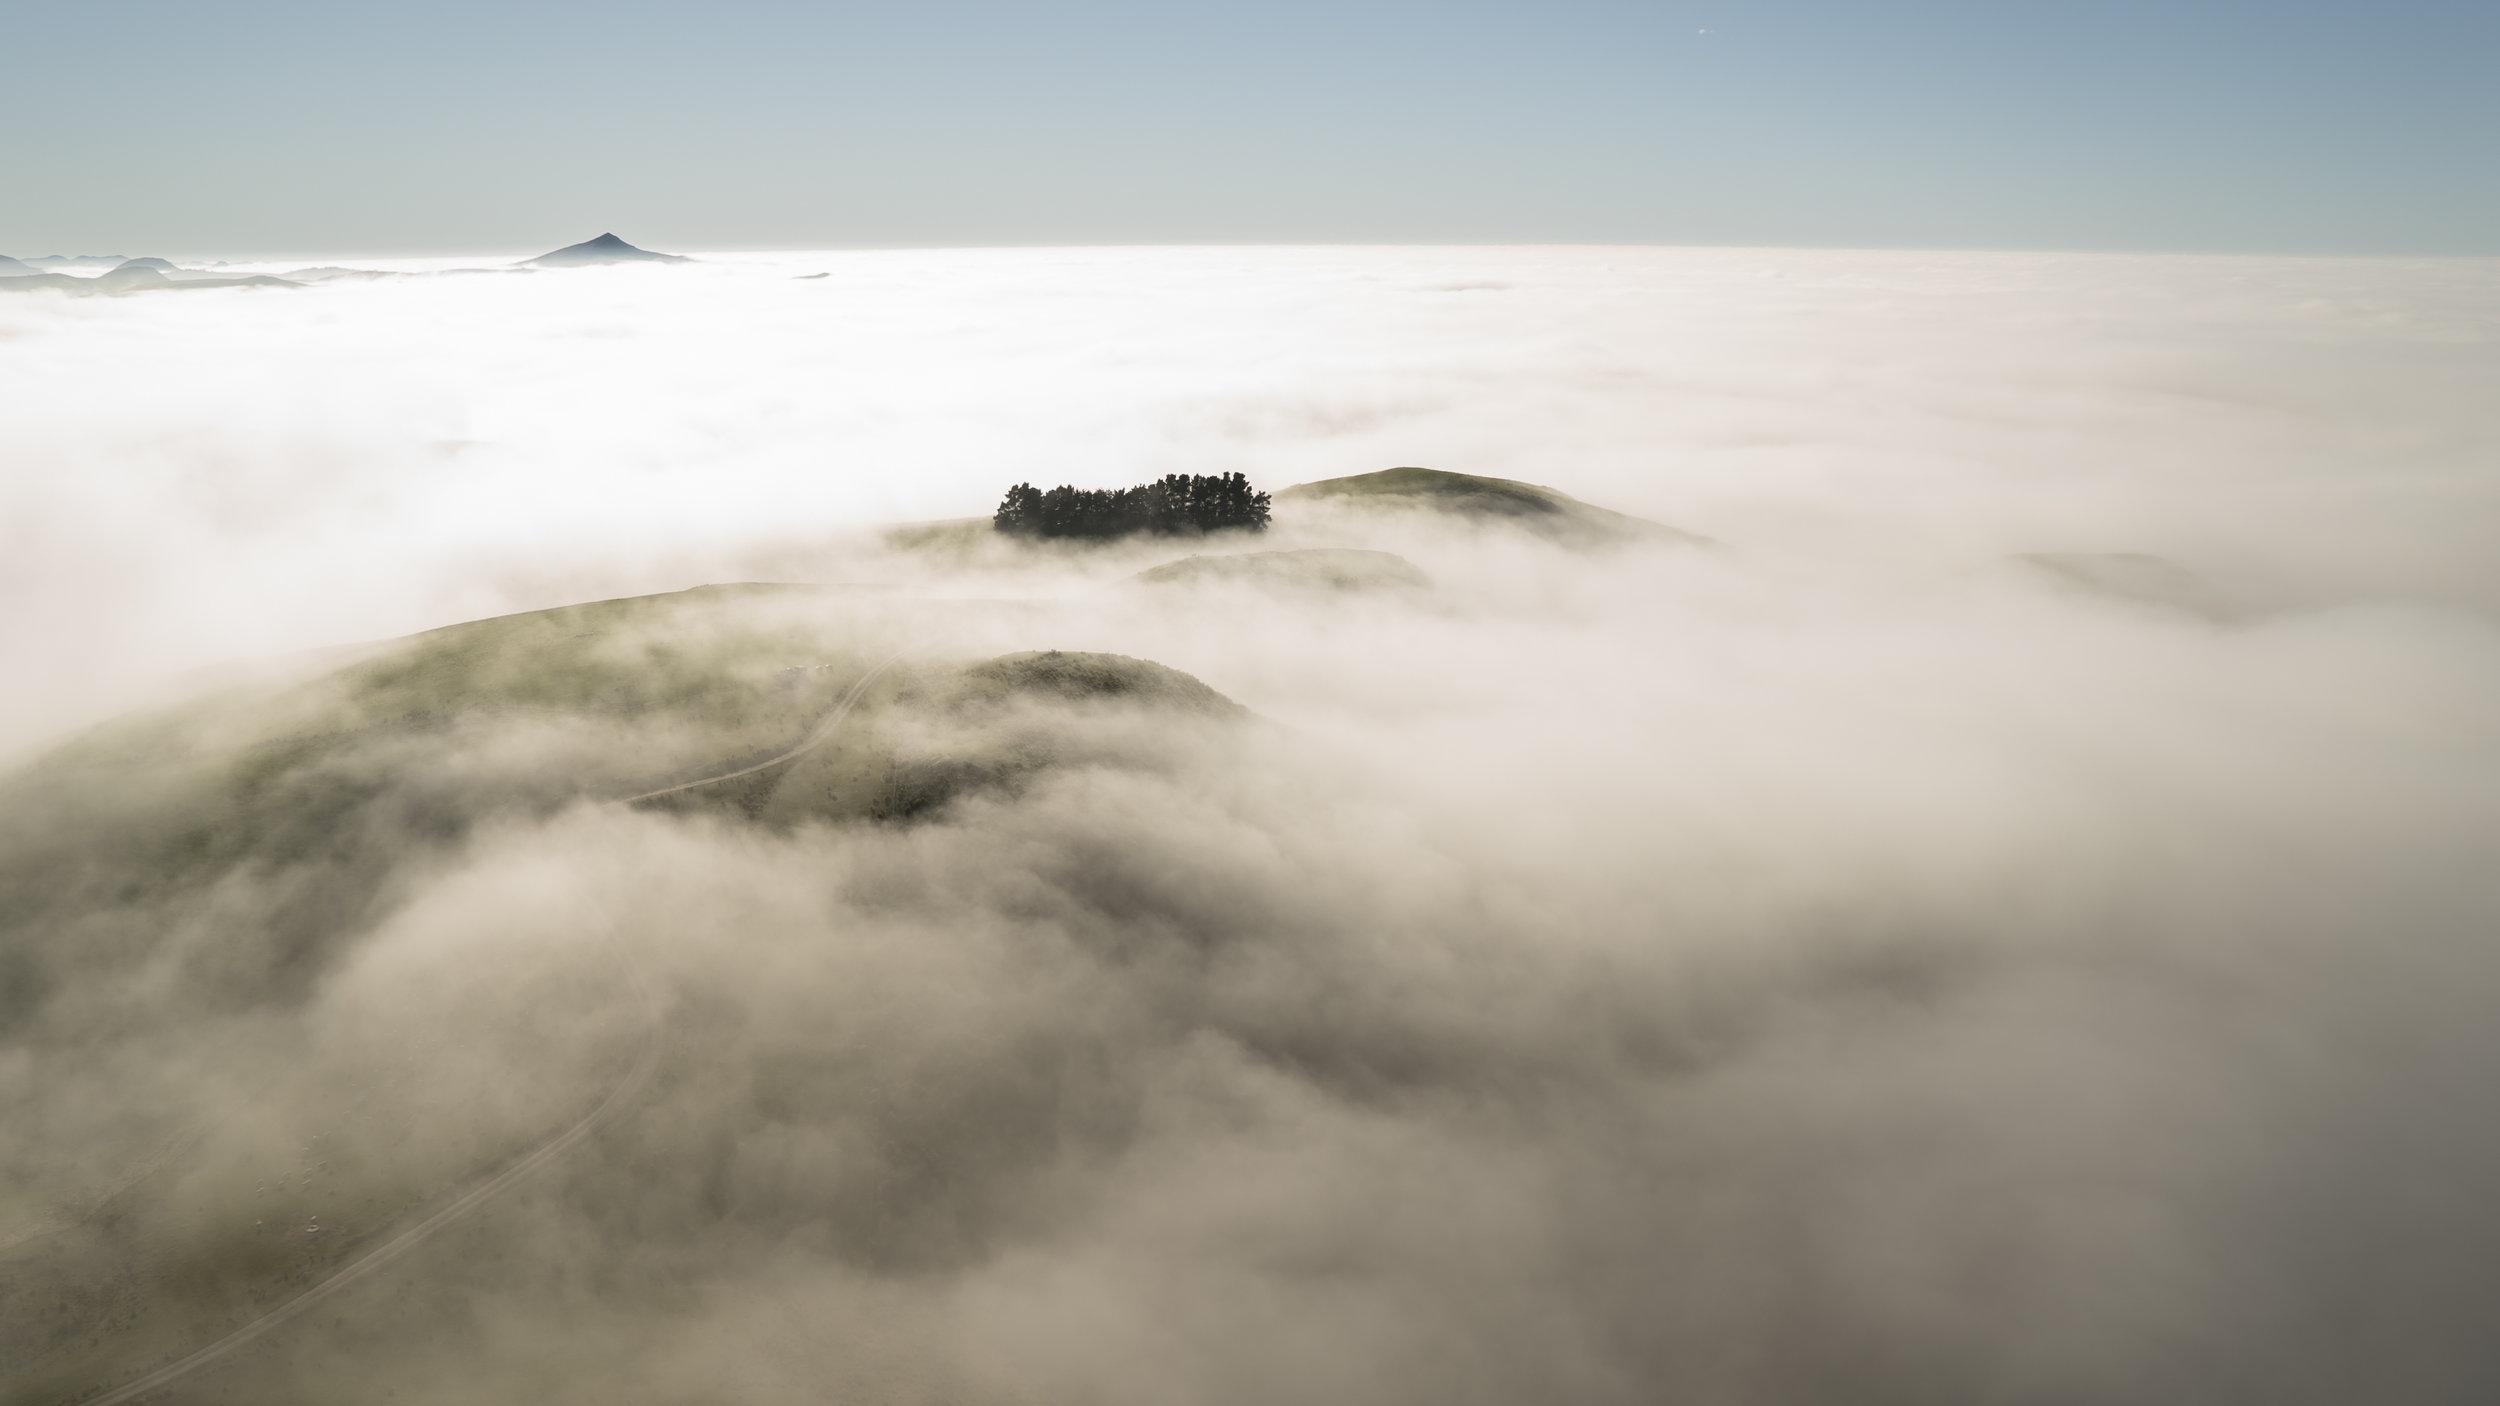 Blucher Road Mist by Scott Mouat